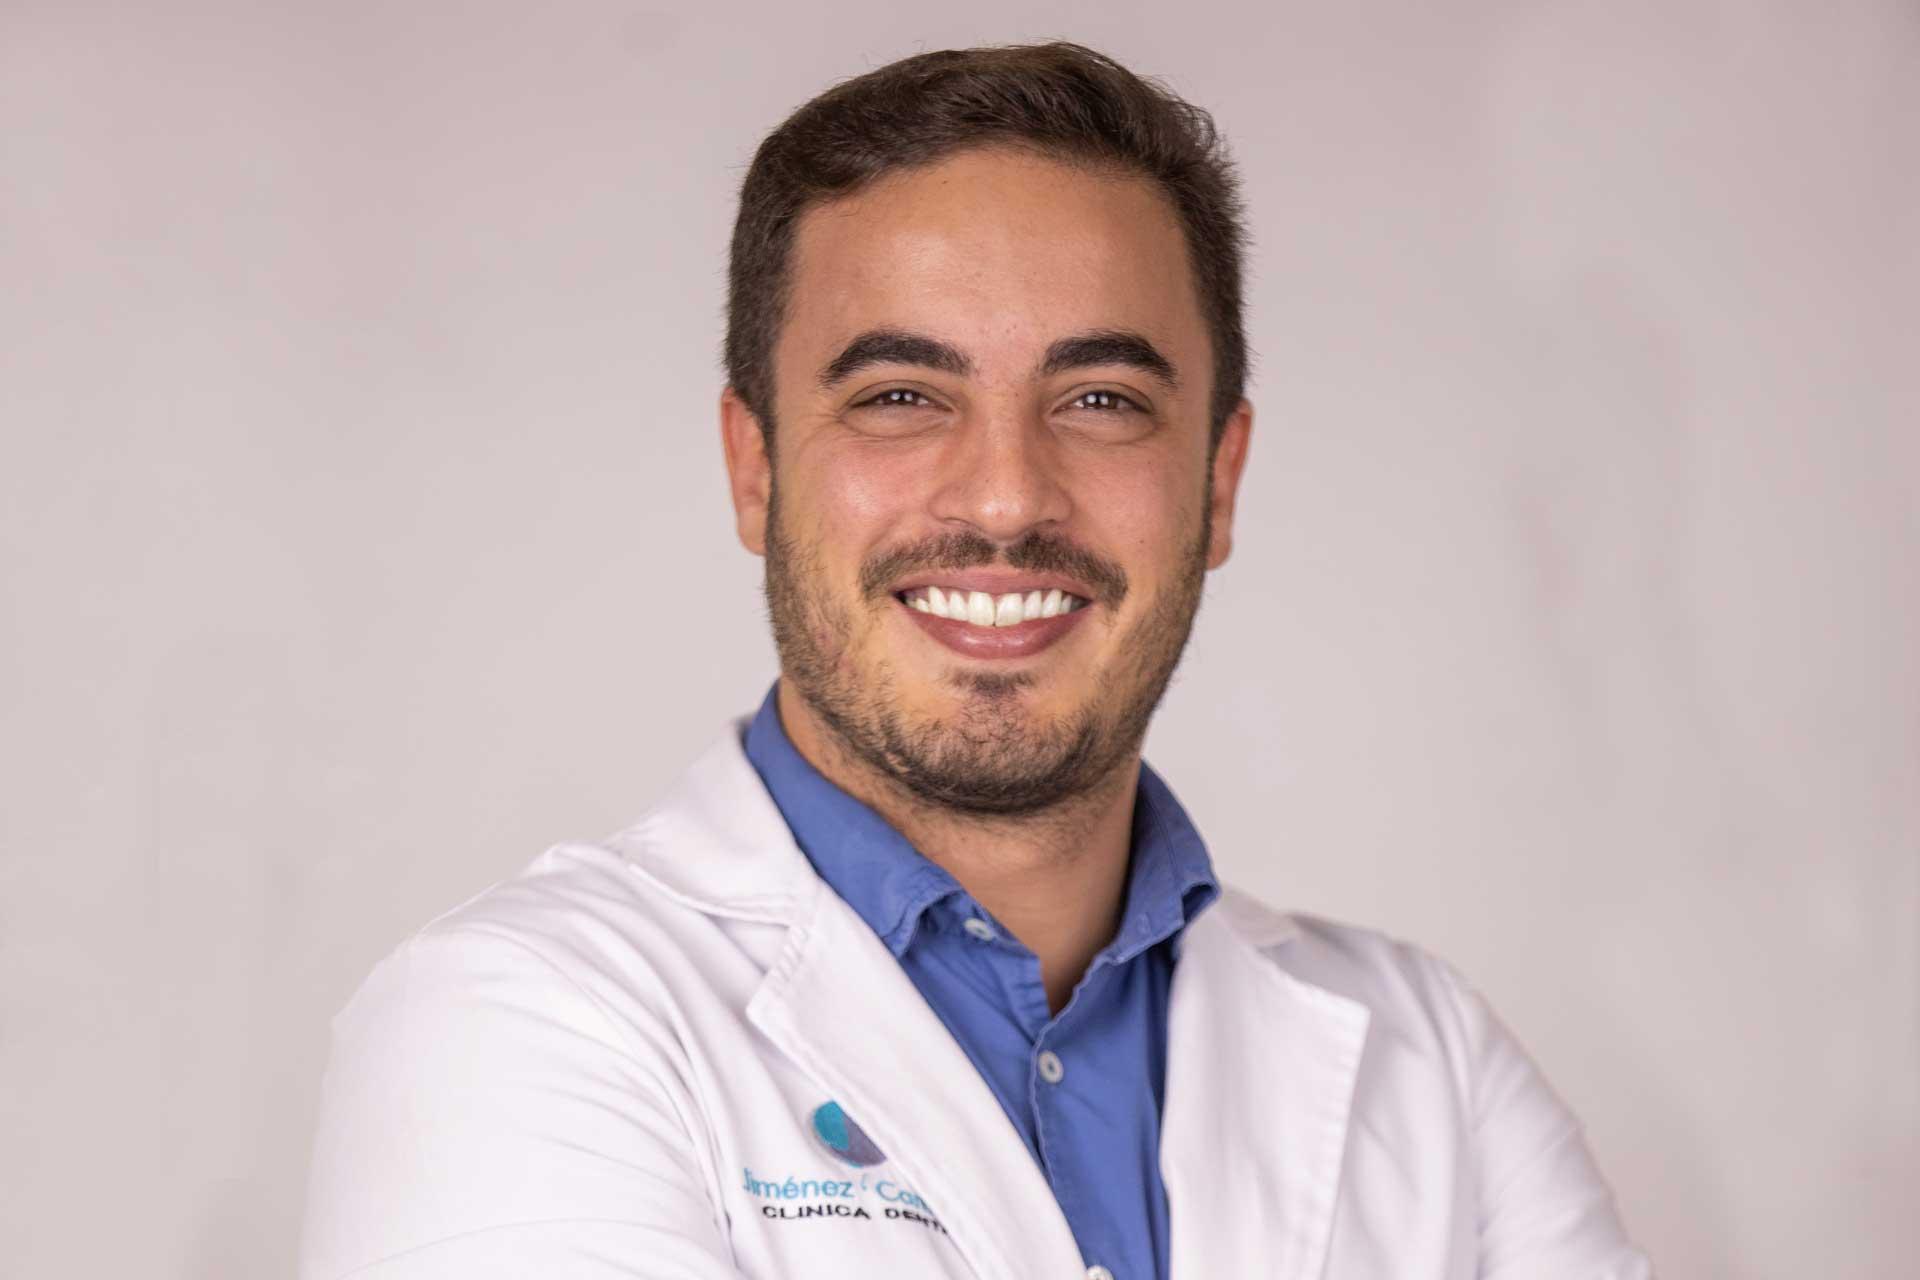 rosendo-clinica-dental-jimenez-camean